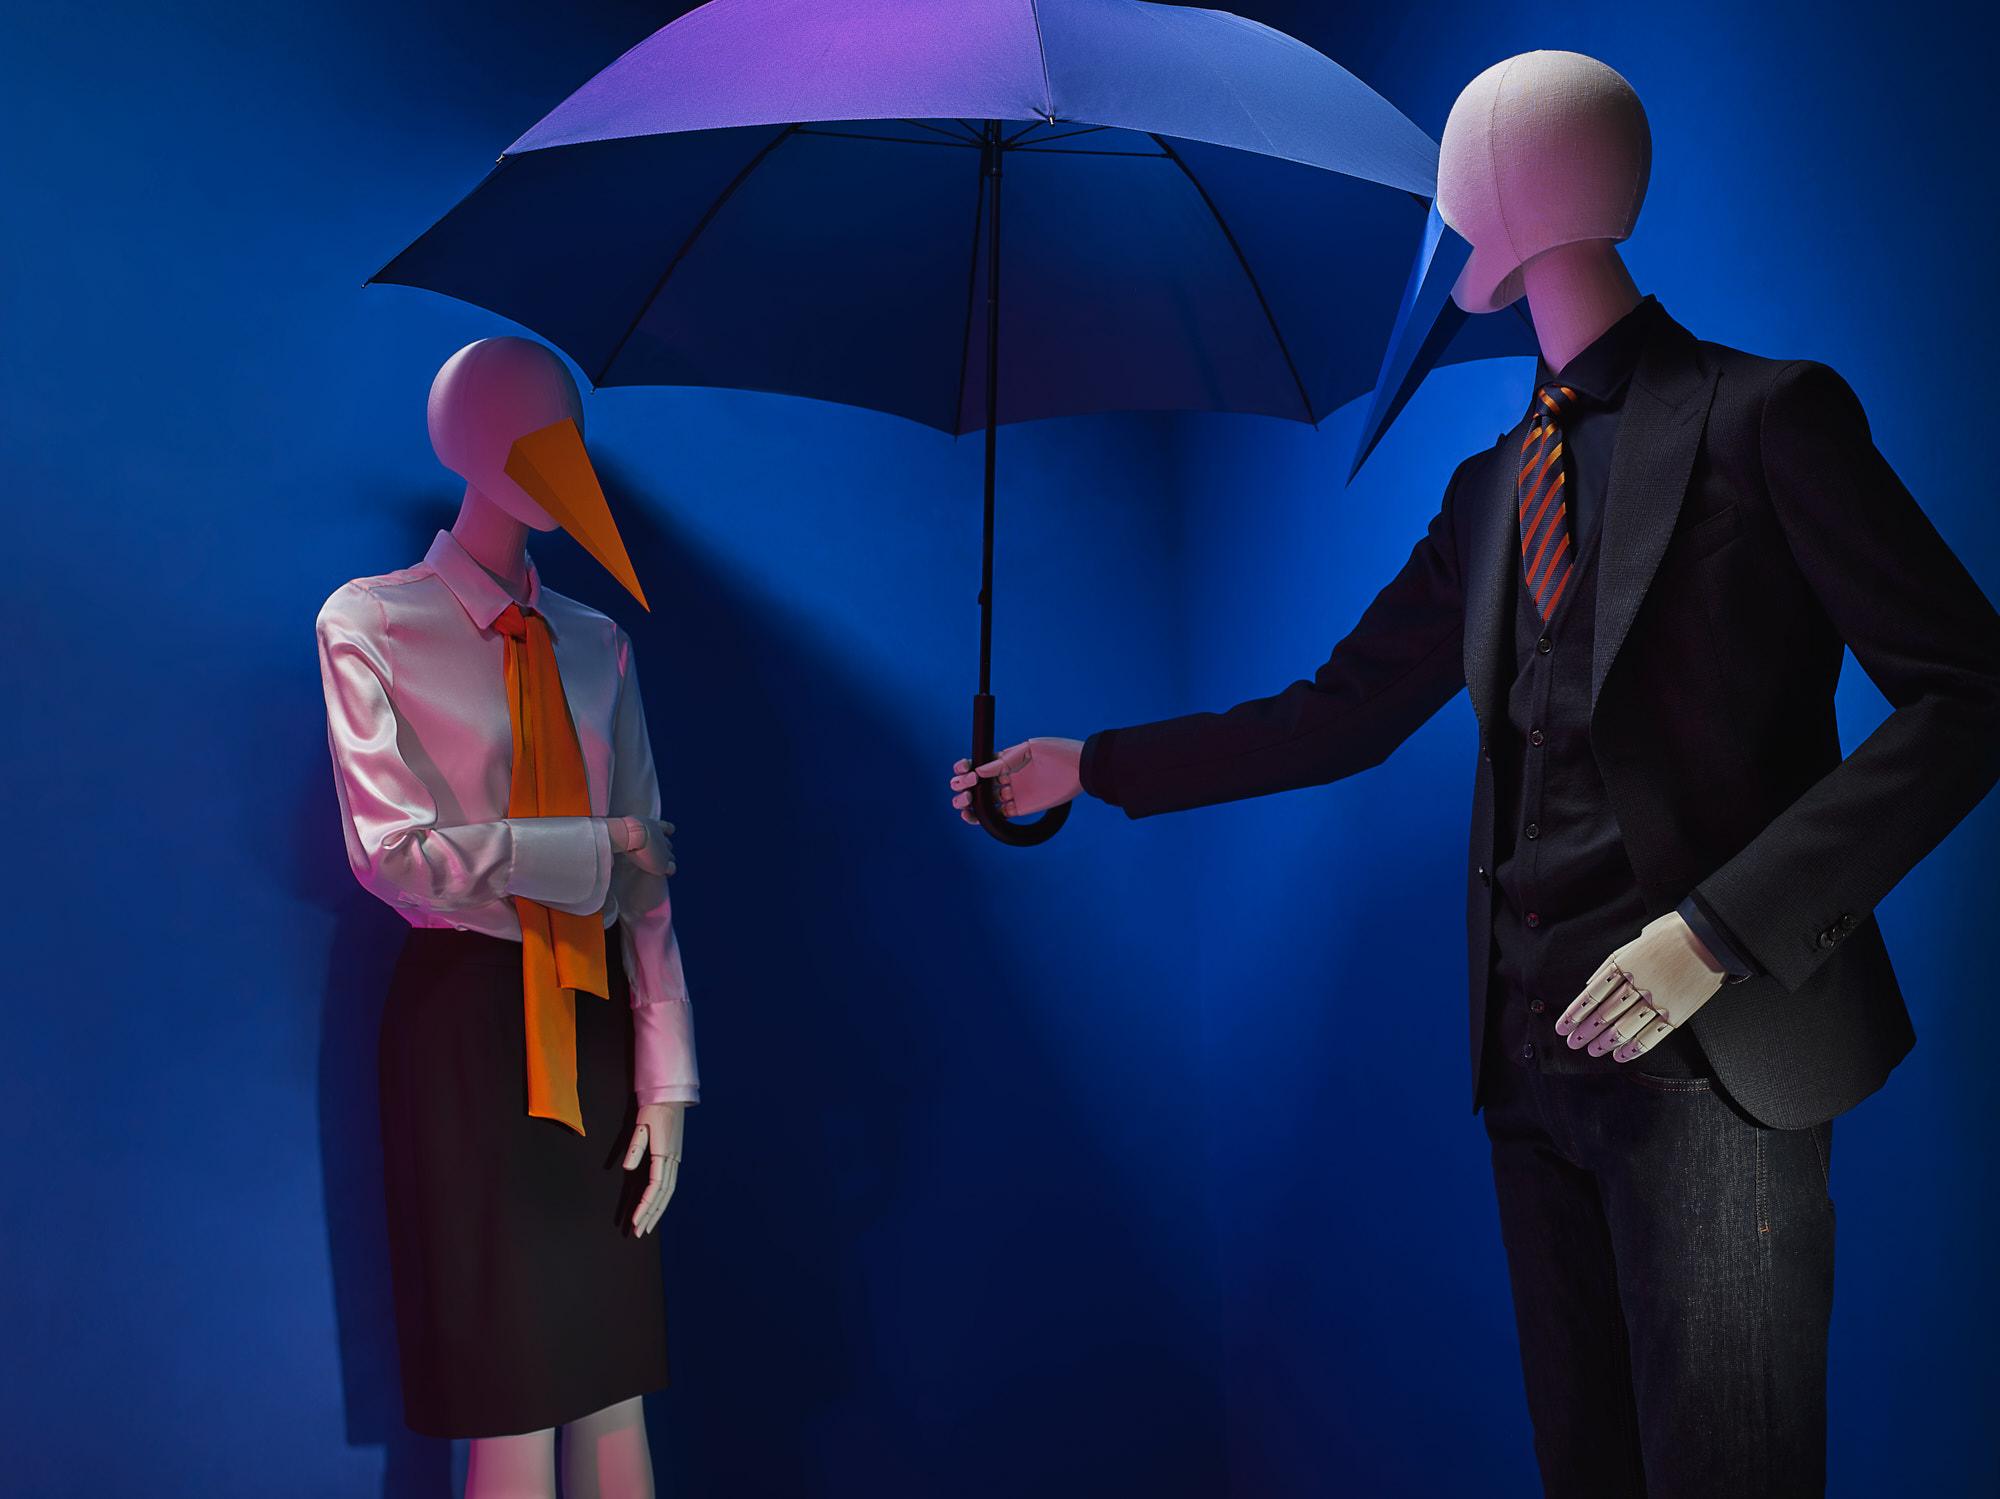 bernd-westphal-stillstars-vanlaack-mannequin-fashion-still-life-photography-005